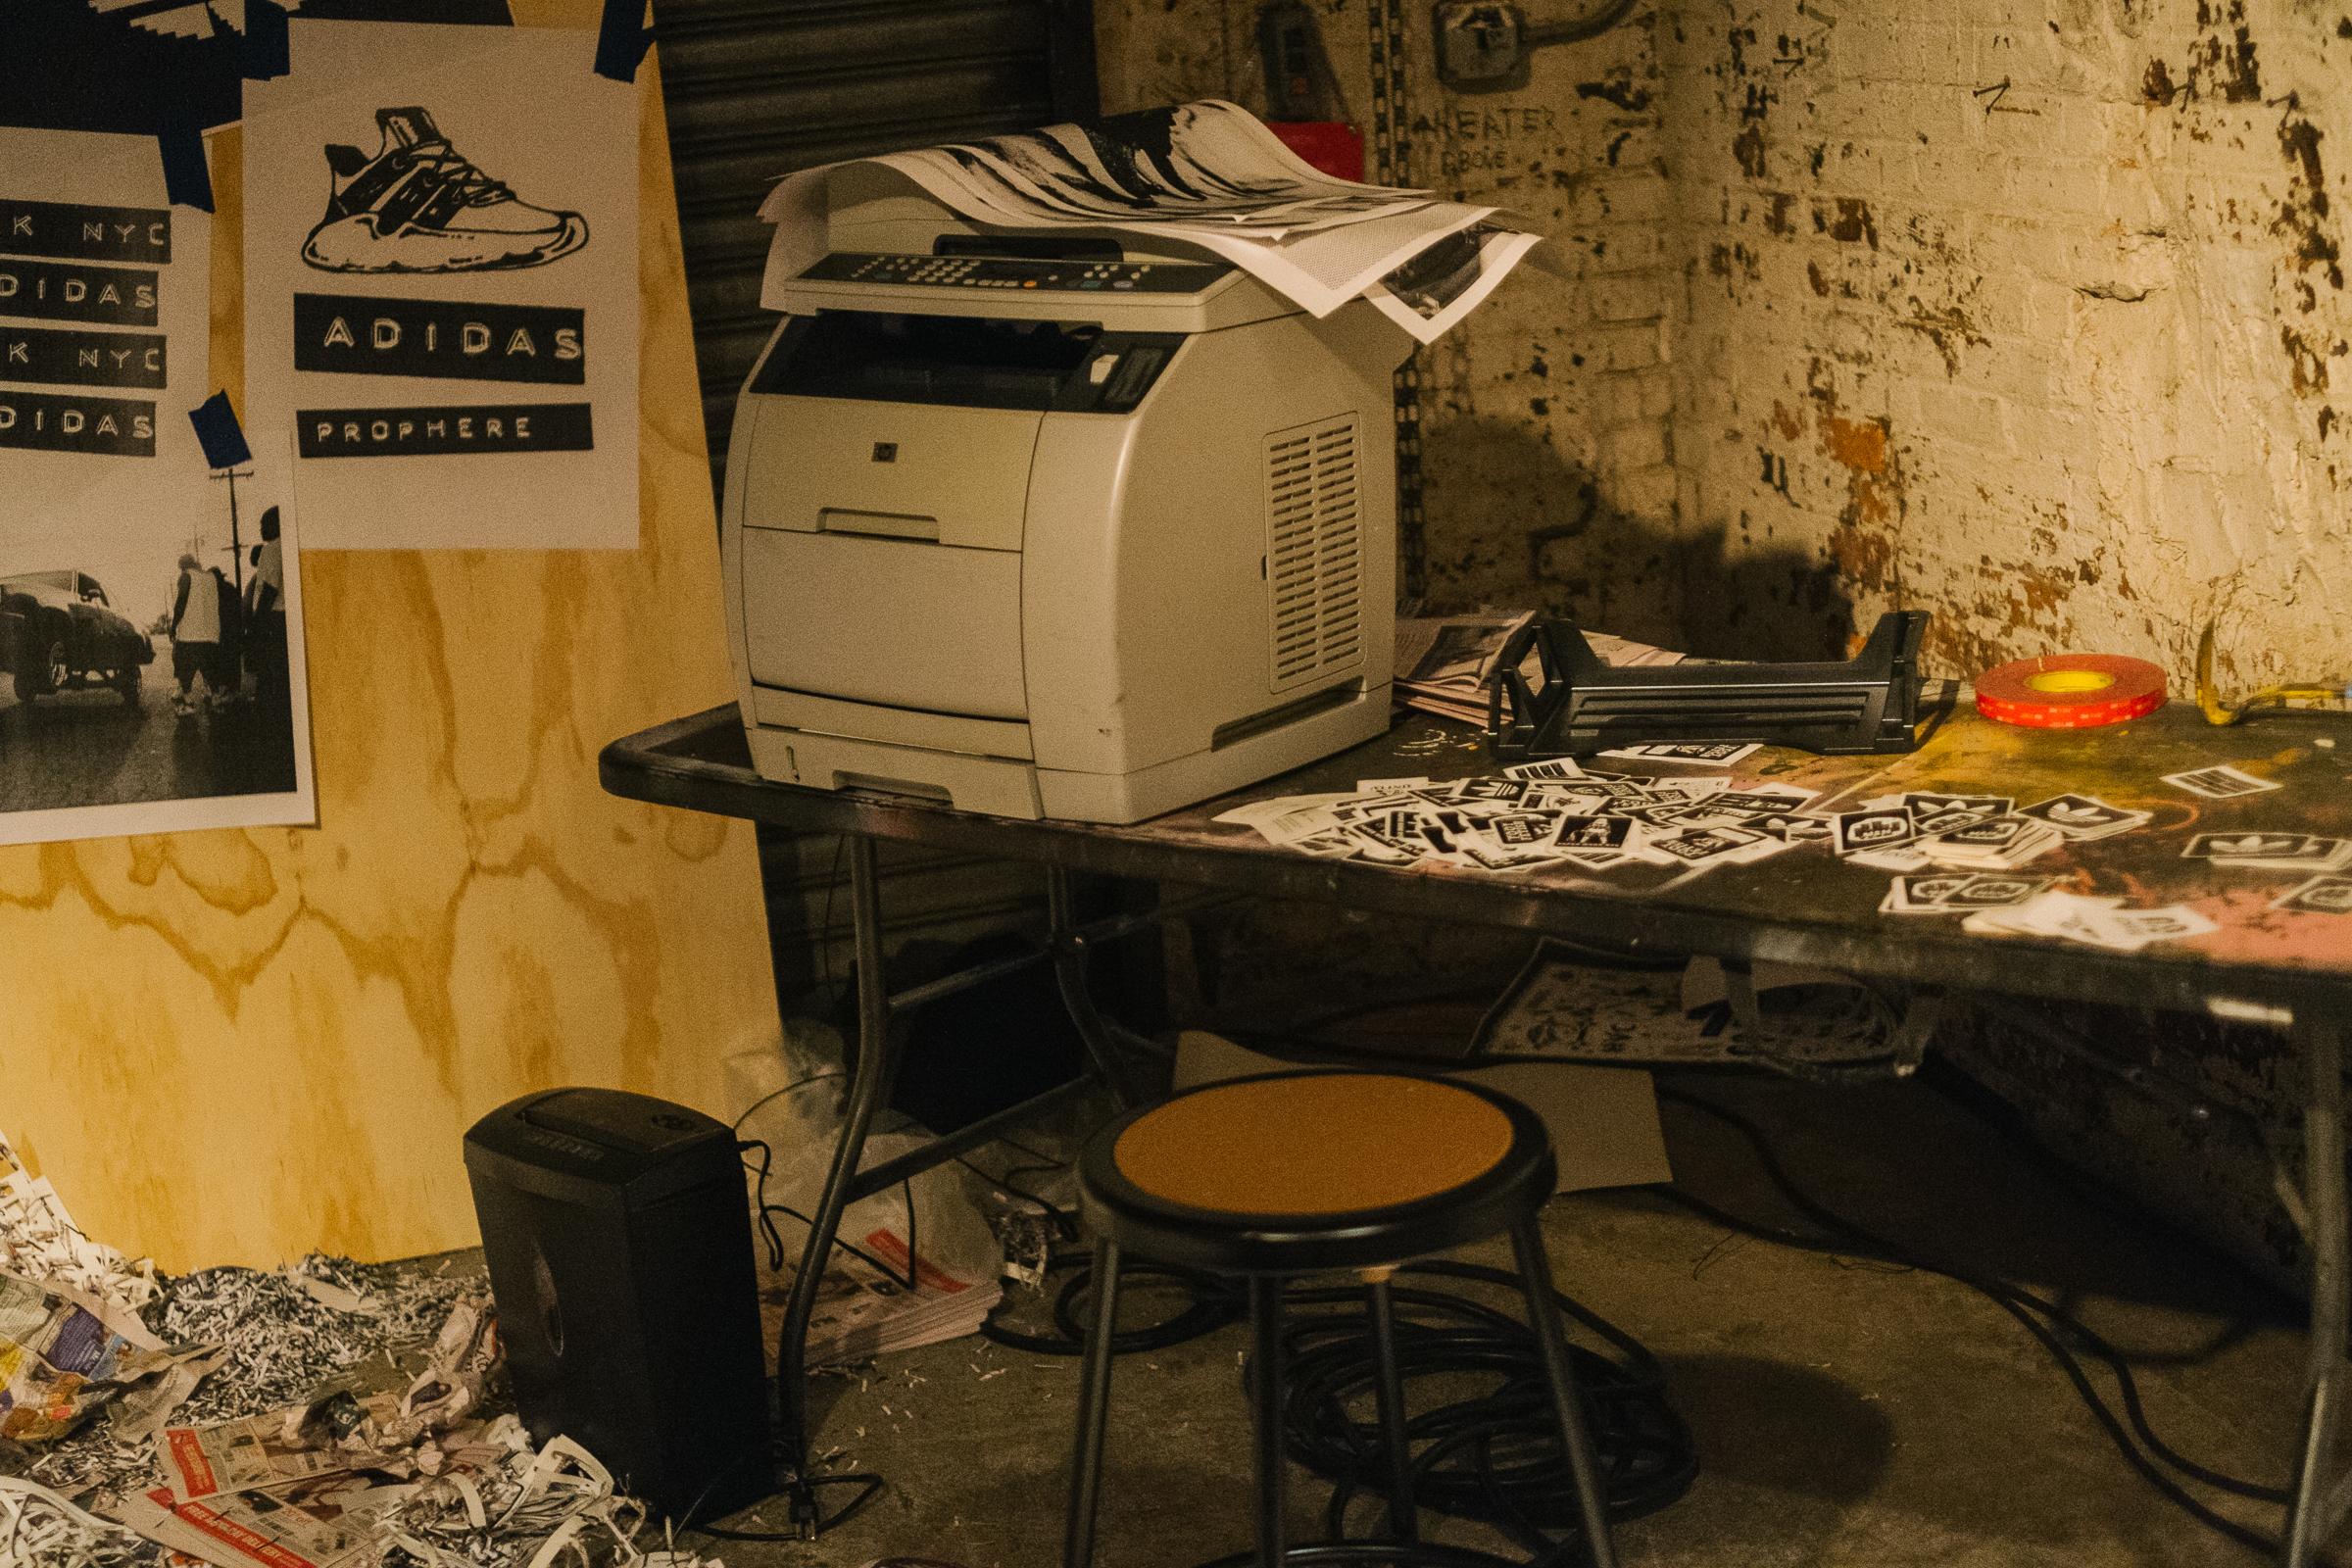 LF_PaperworkNYC+x+Adidas-5.jpg